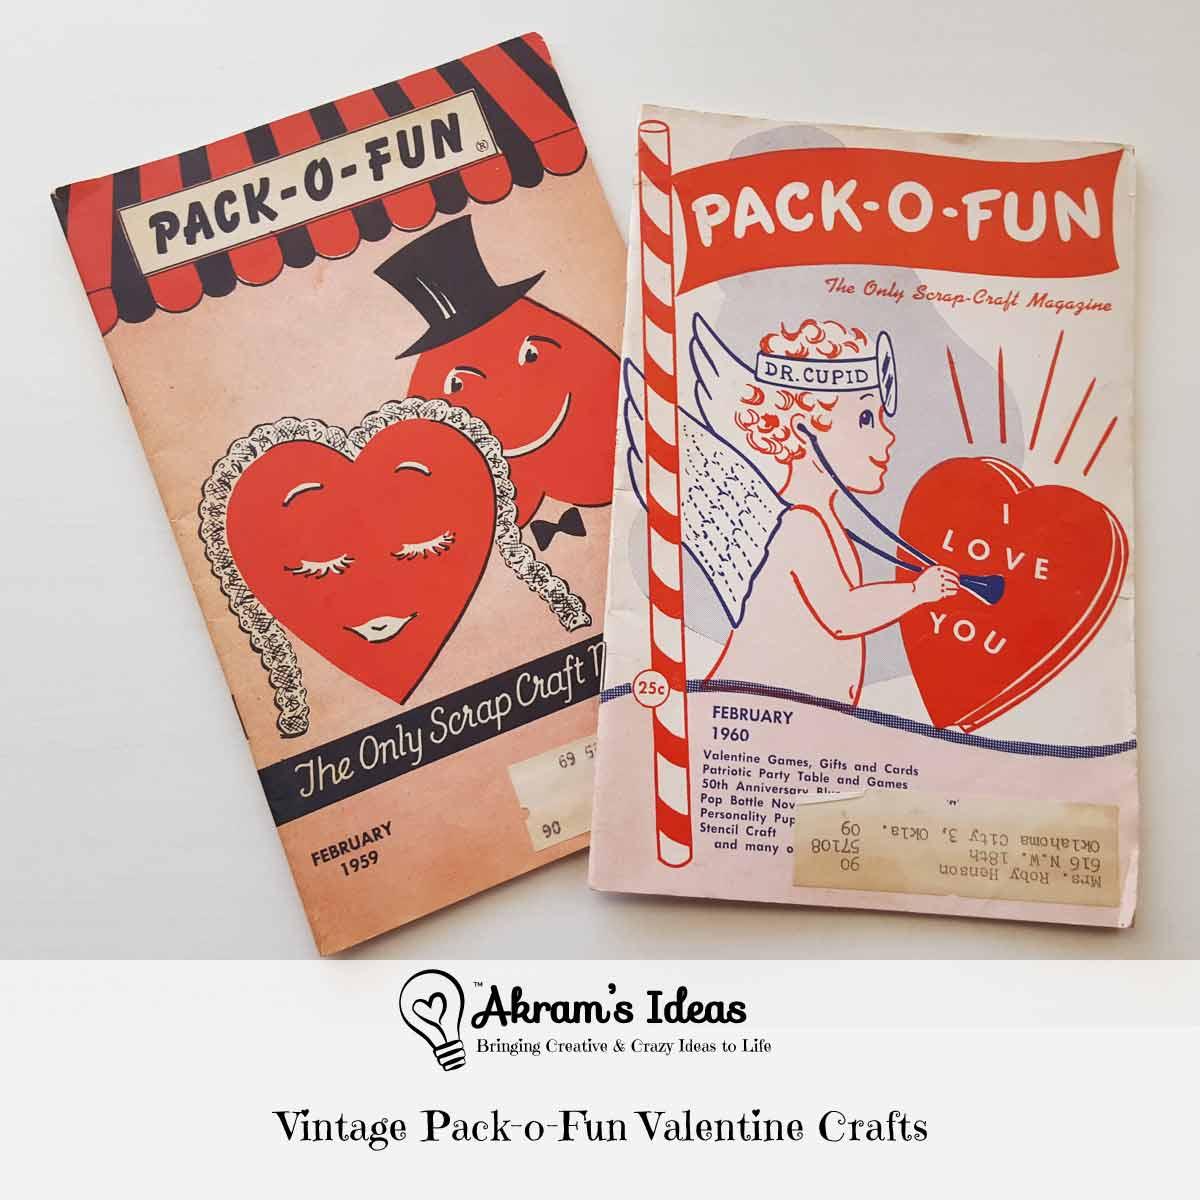 Vintage Pack-o-Fun Valentine Crafts